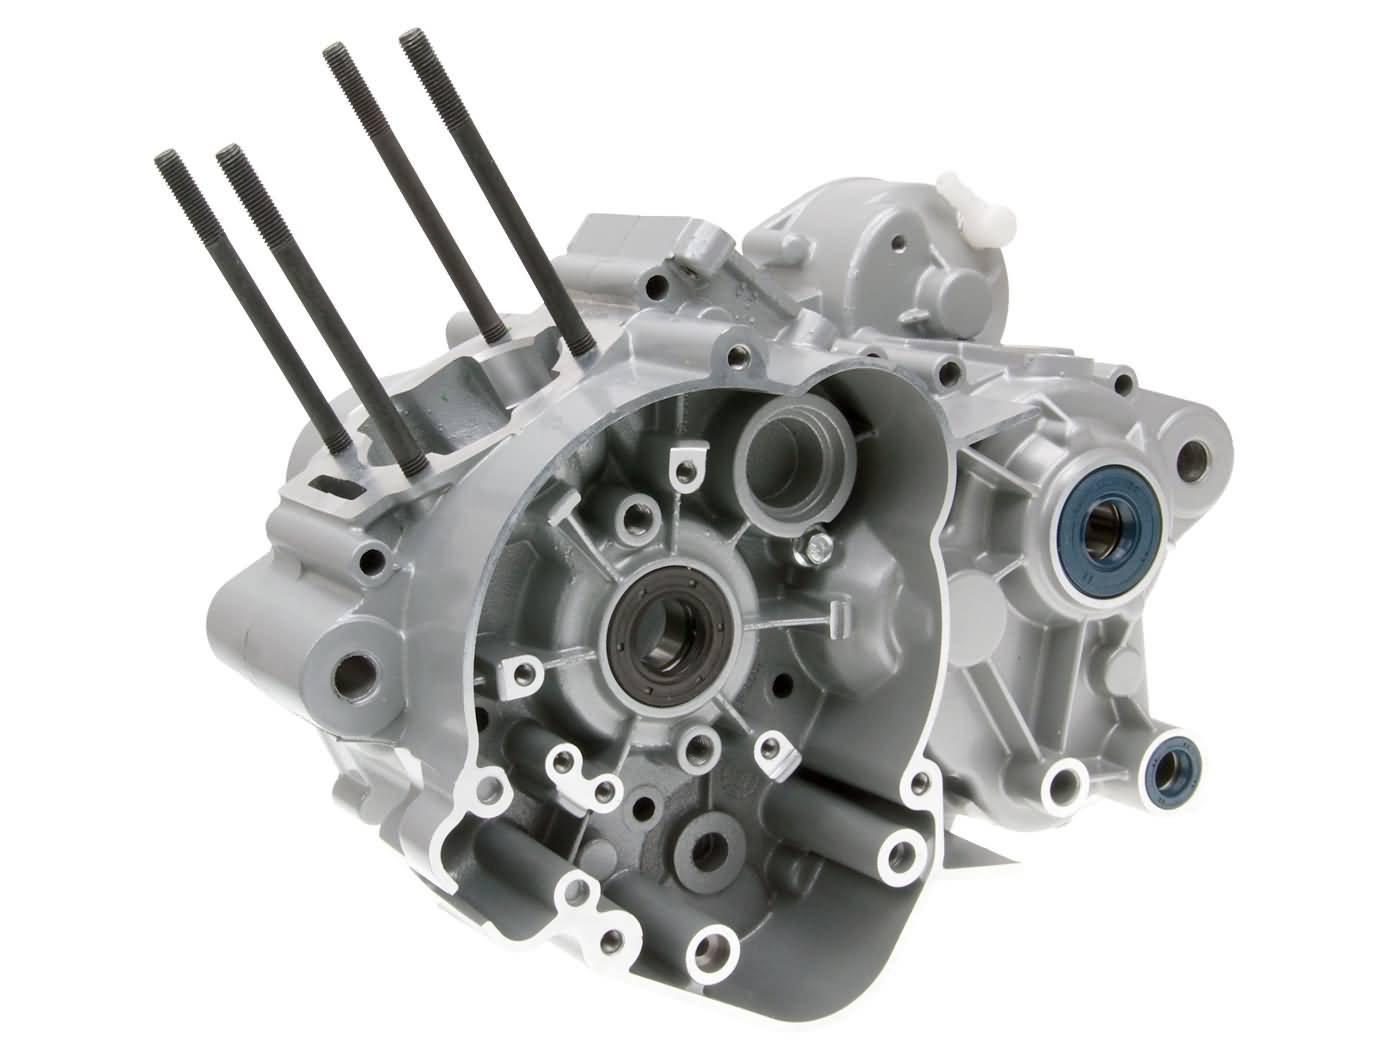 Kurbelgehäuse/Motor Derbi Senda GPR, Aprilia RS RX SX, Gilera RCR ...